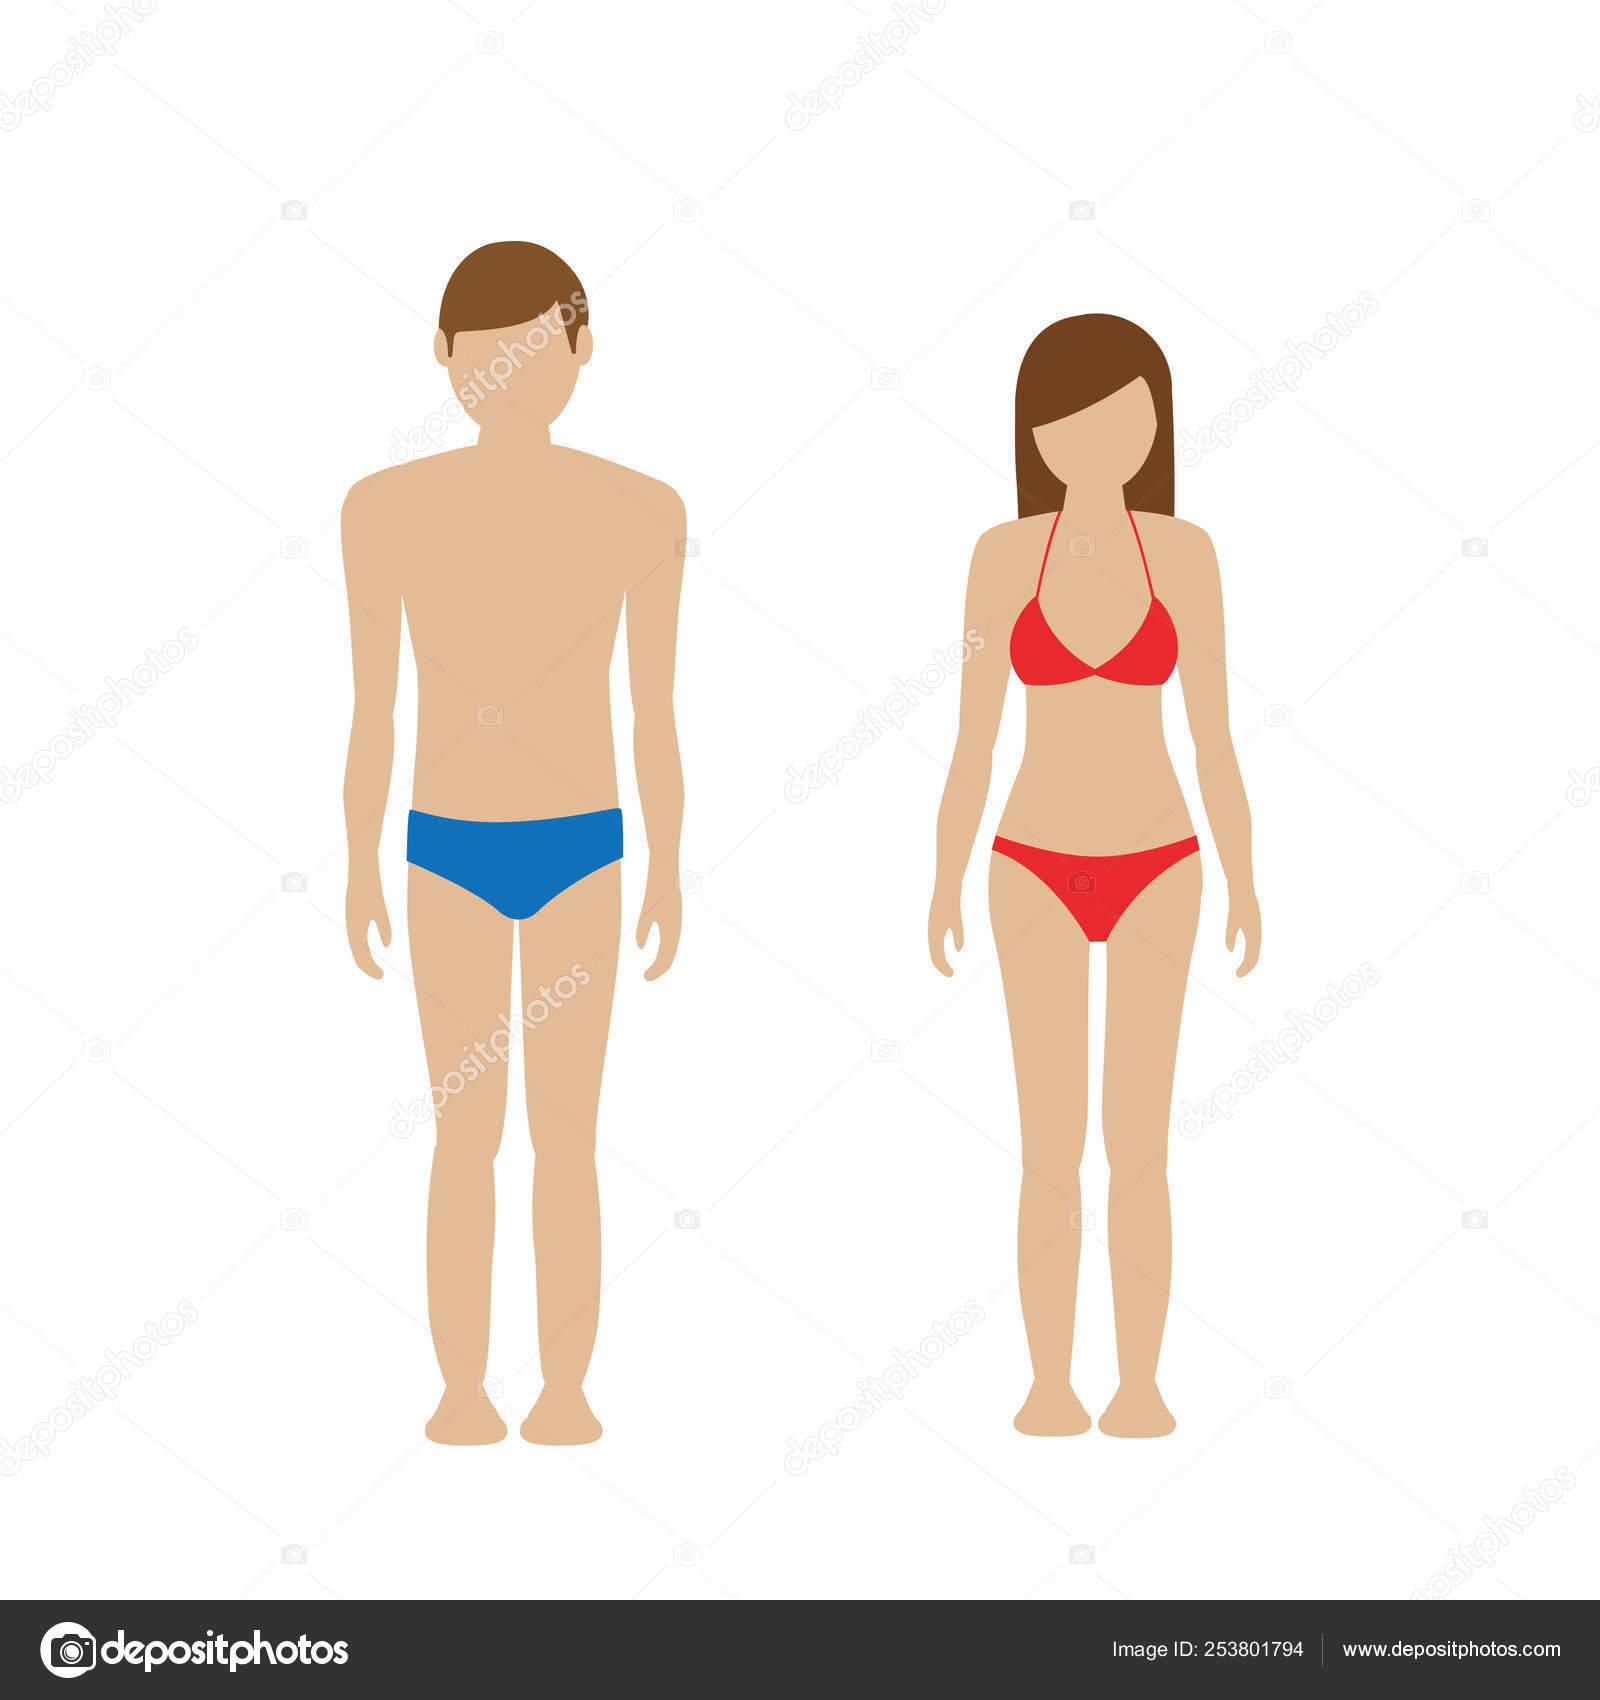 Bikini En De Hombre Traje Bañador Carácter Mujer Y Baño E9YDW2eHI